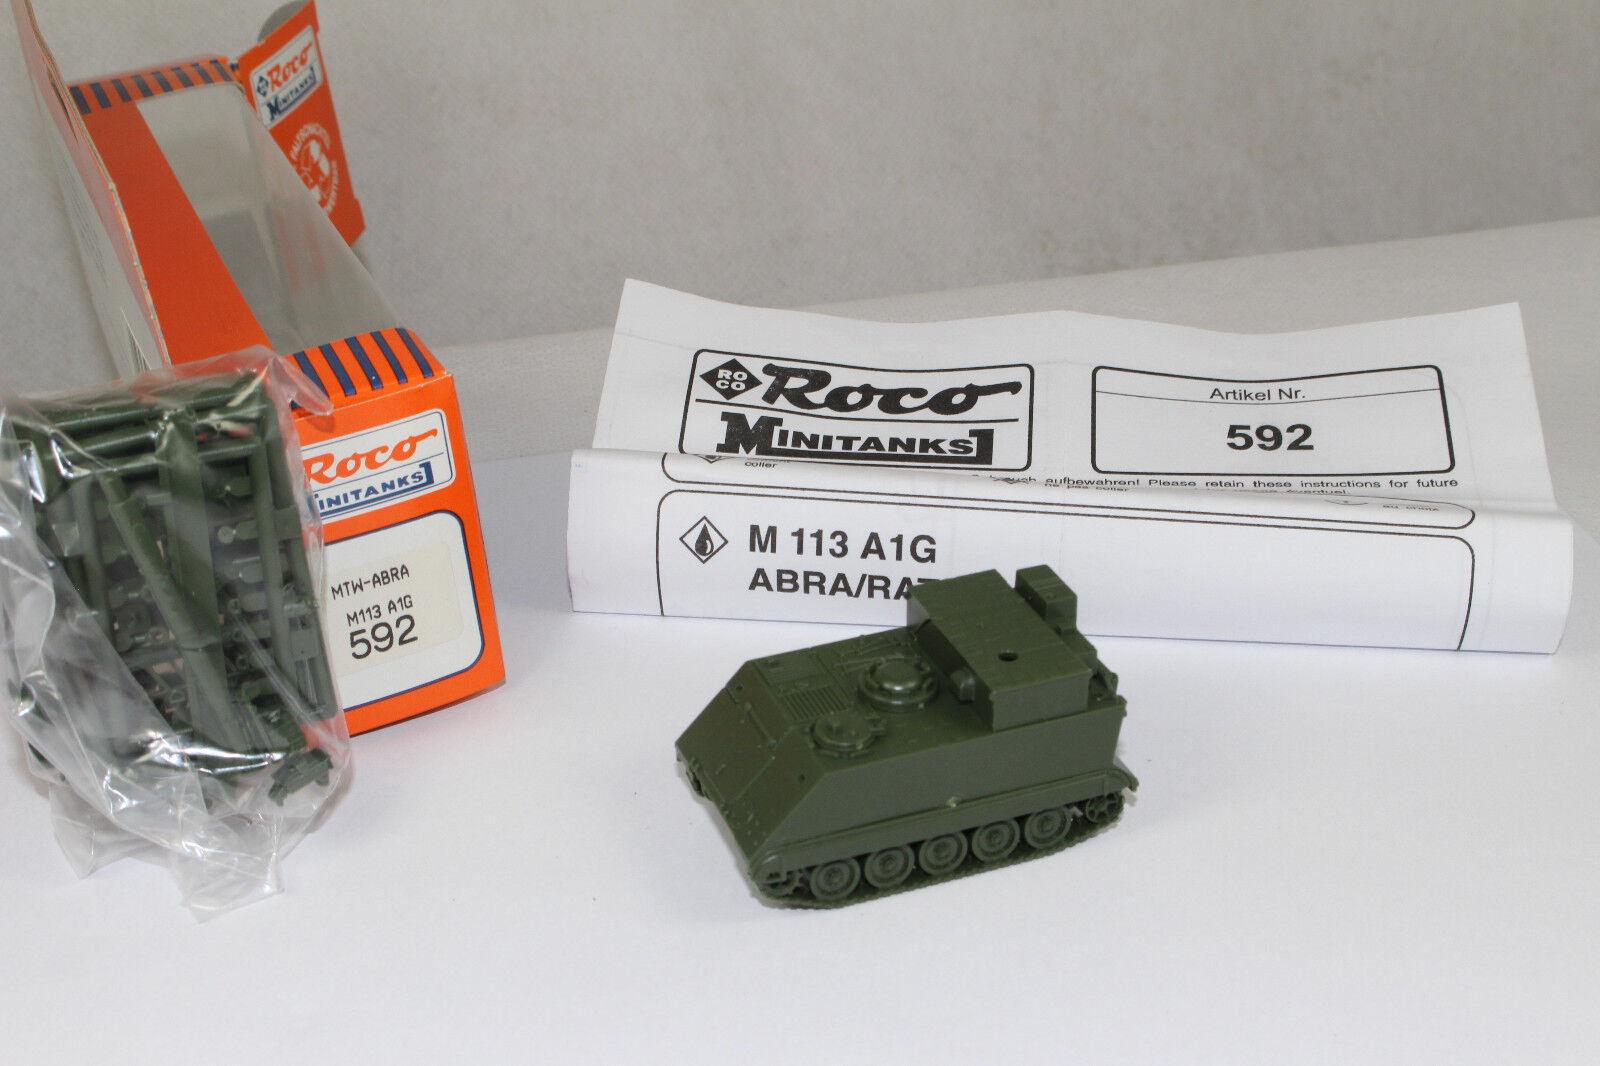 Ro1146, RocoMinitanks 592 M113 A1G A1G A1G ABRA radar artillery vehi. BOX mint 1 87 HO 7a7645